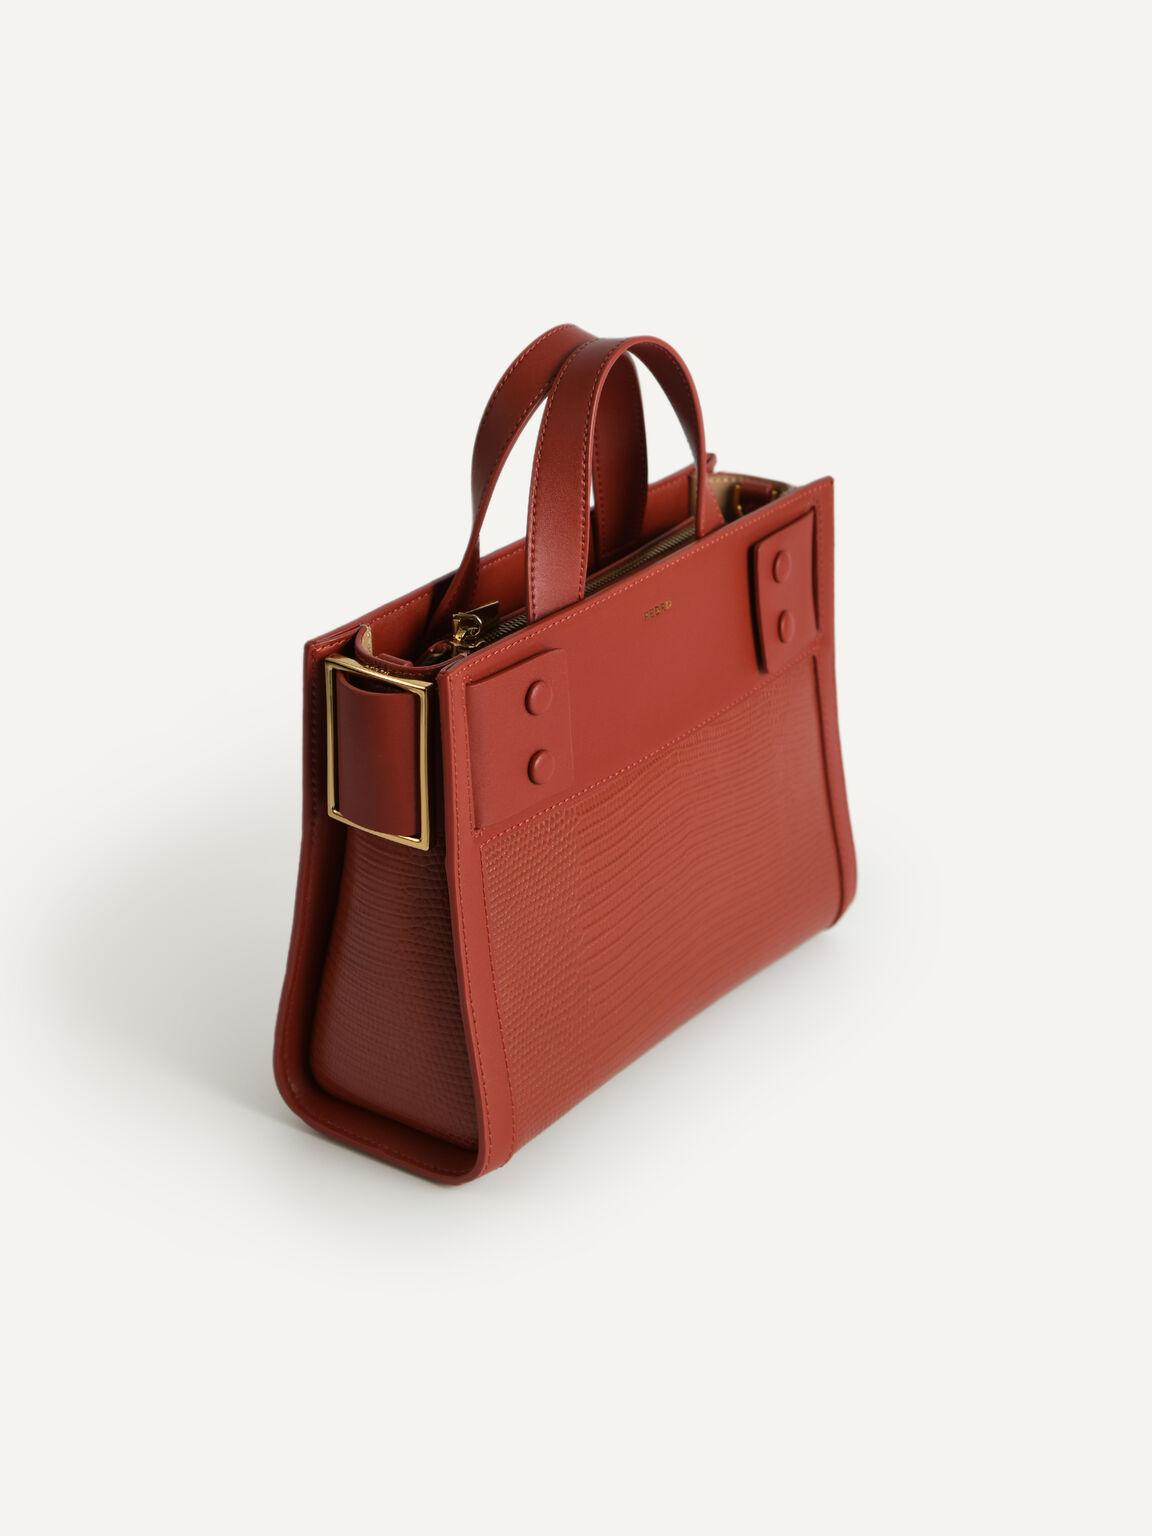 Lizard-Effect Leather Top Handle Bag, Brick, hi-res